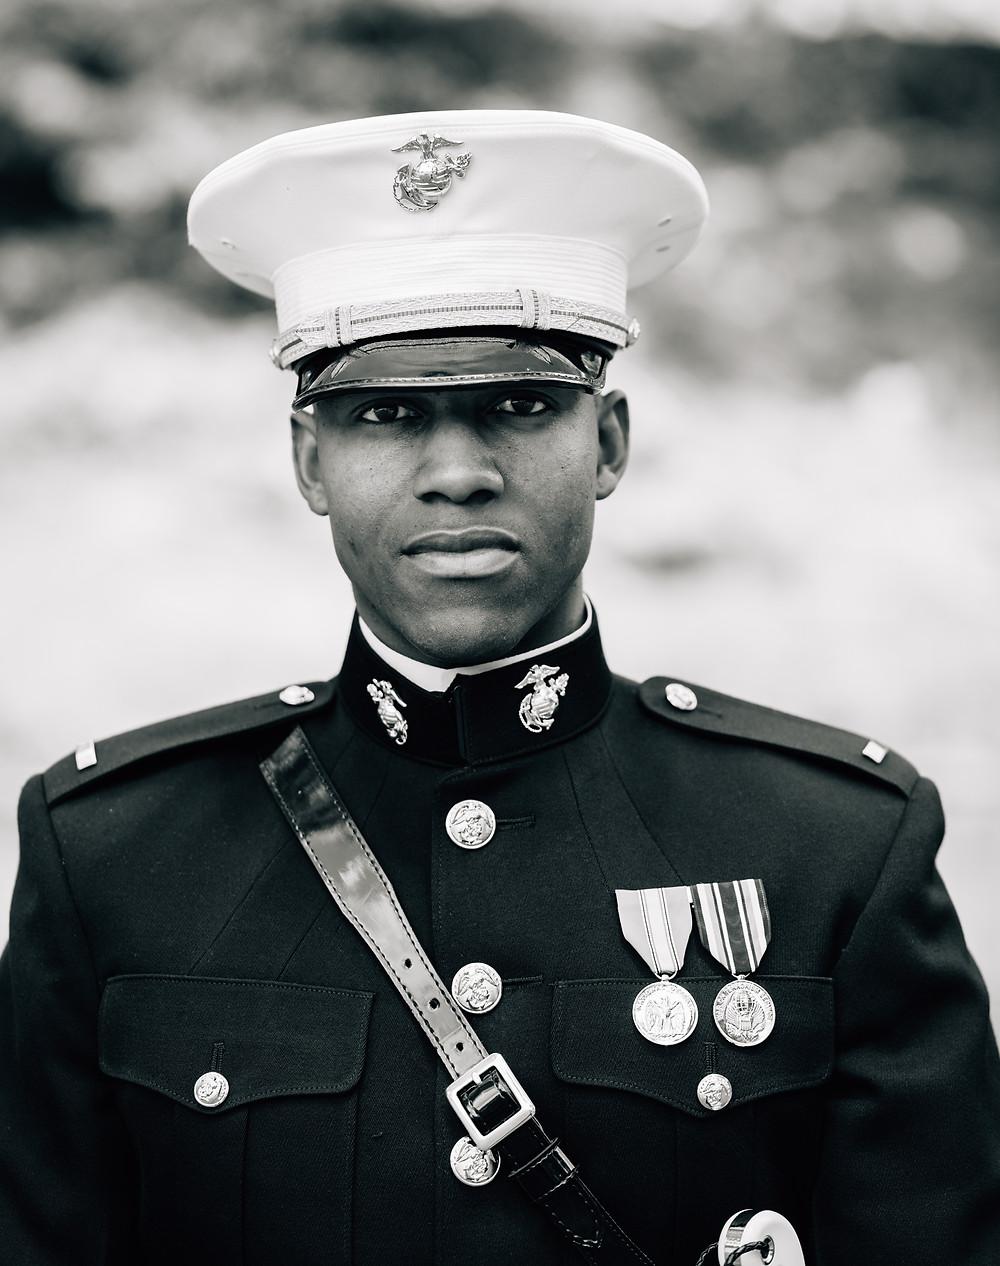 Marine groom portrait close up